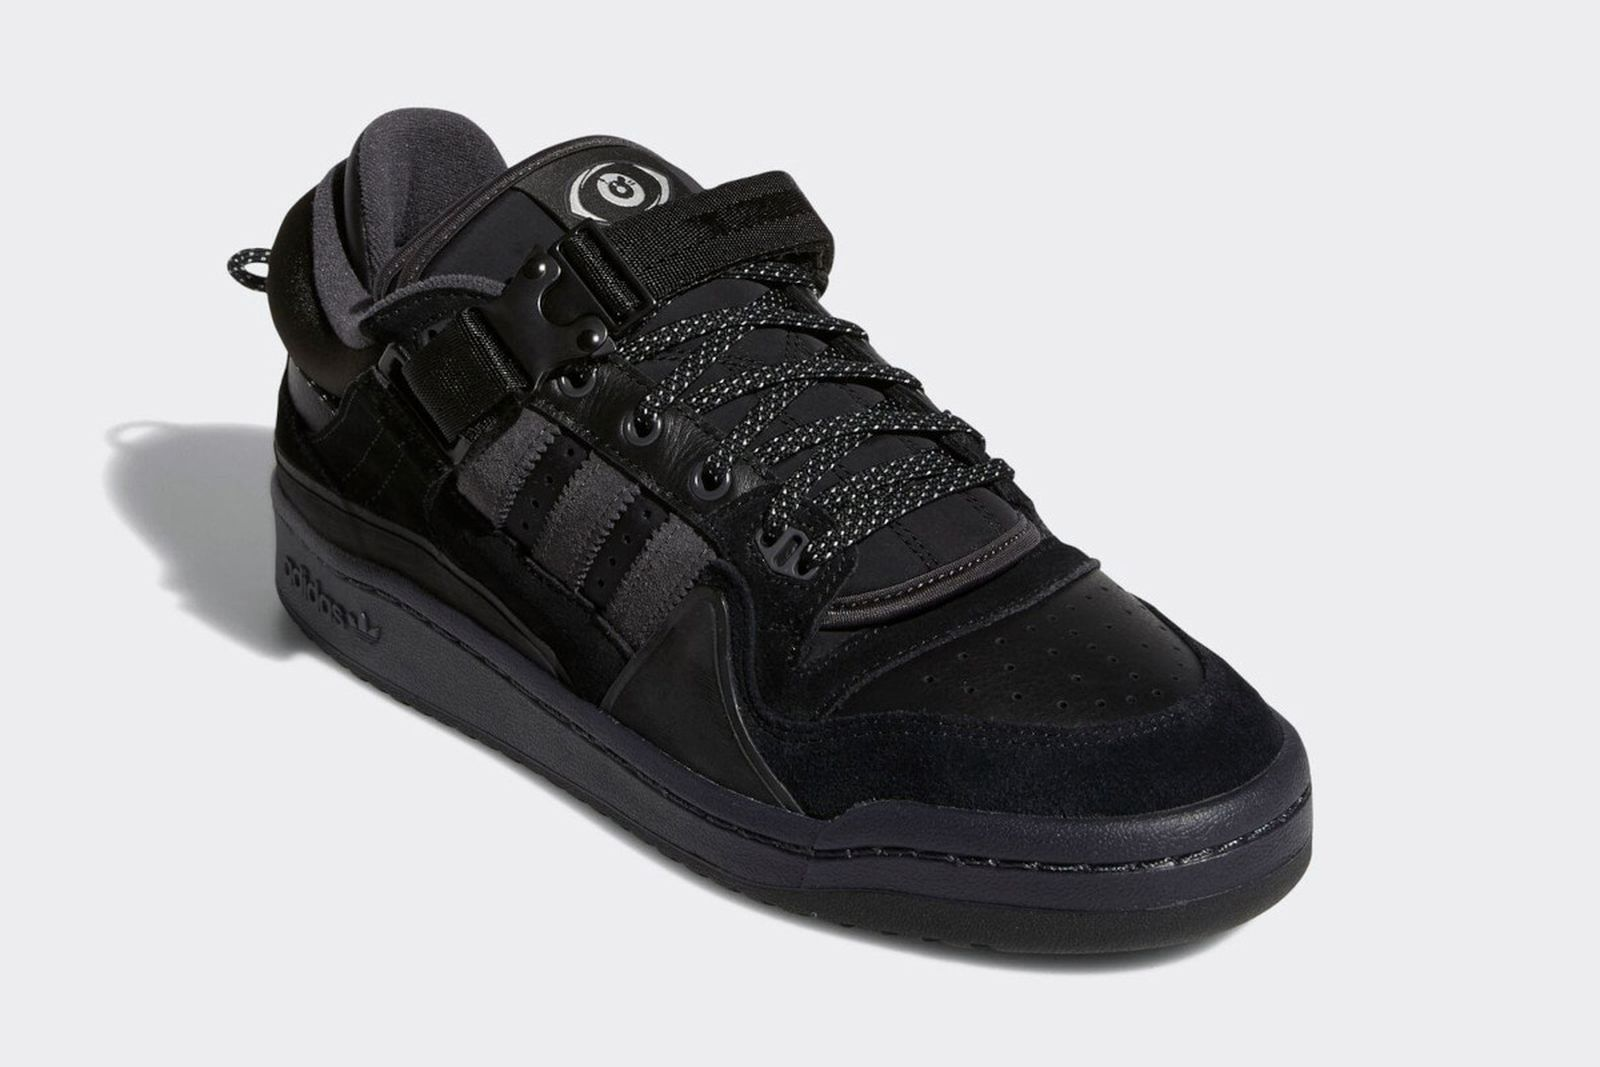 bad-bunny-adidas-originals-forum-low-triple-black-release-date-price-05